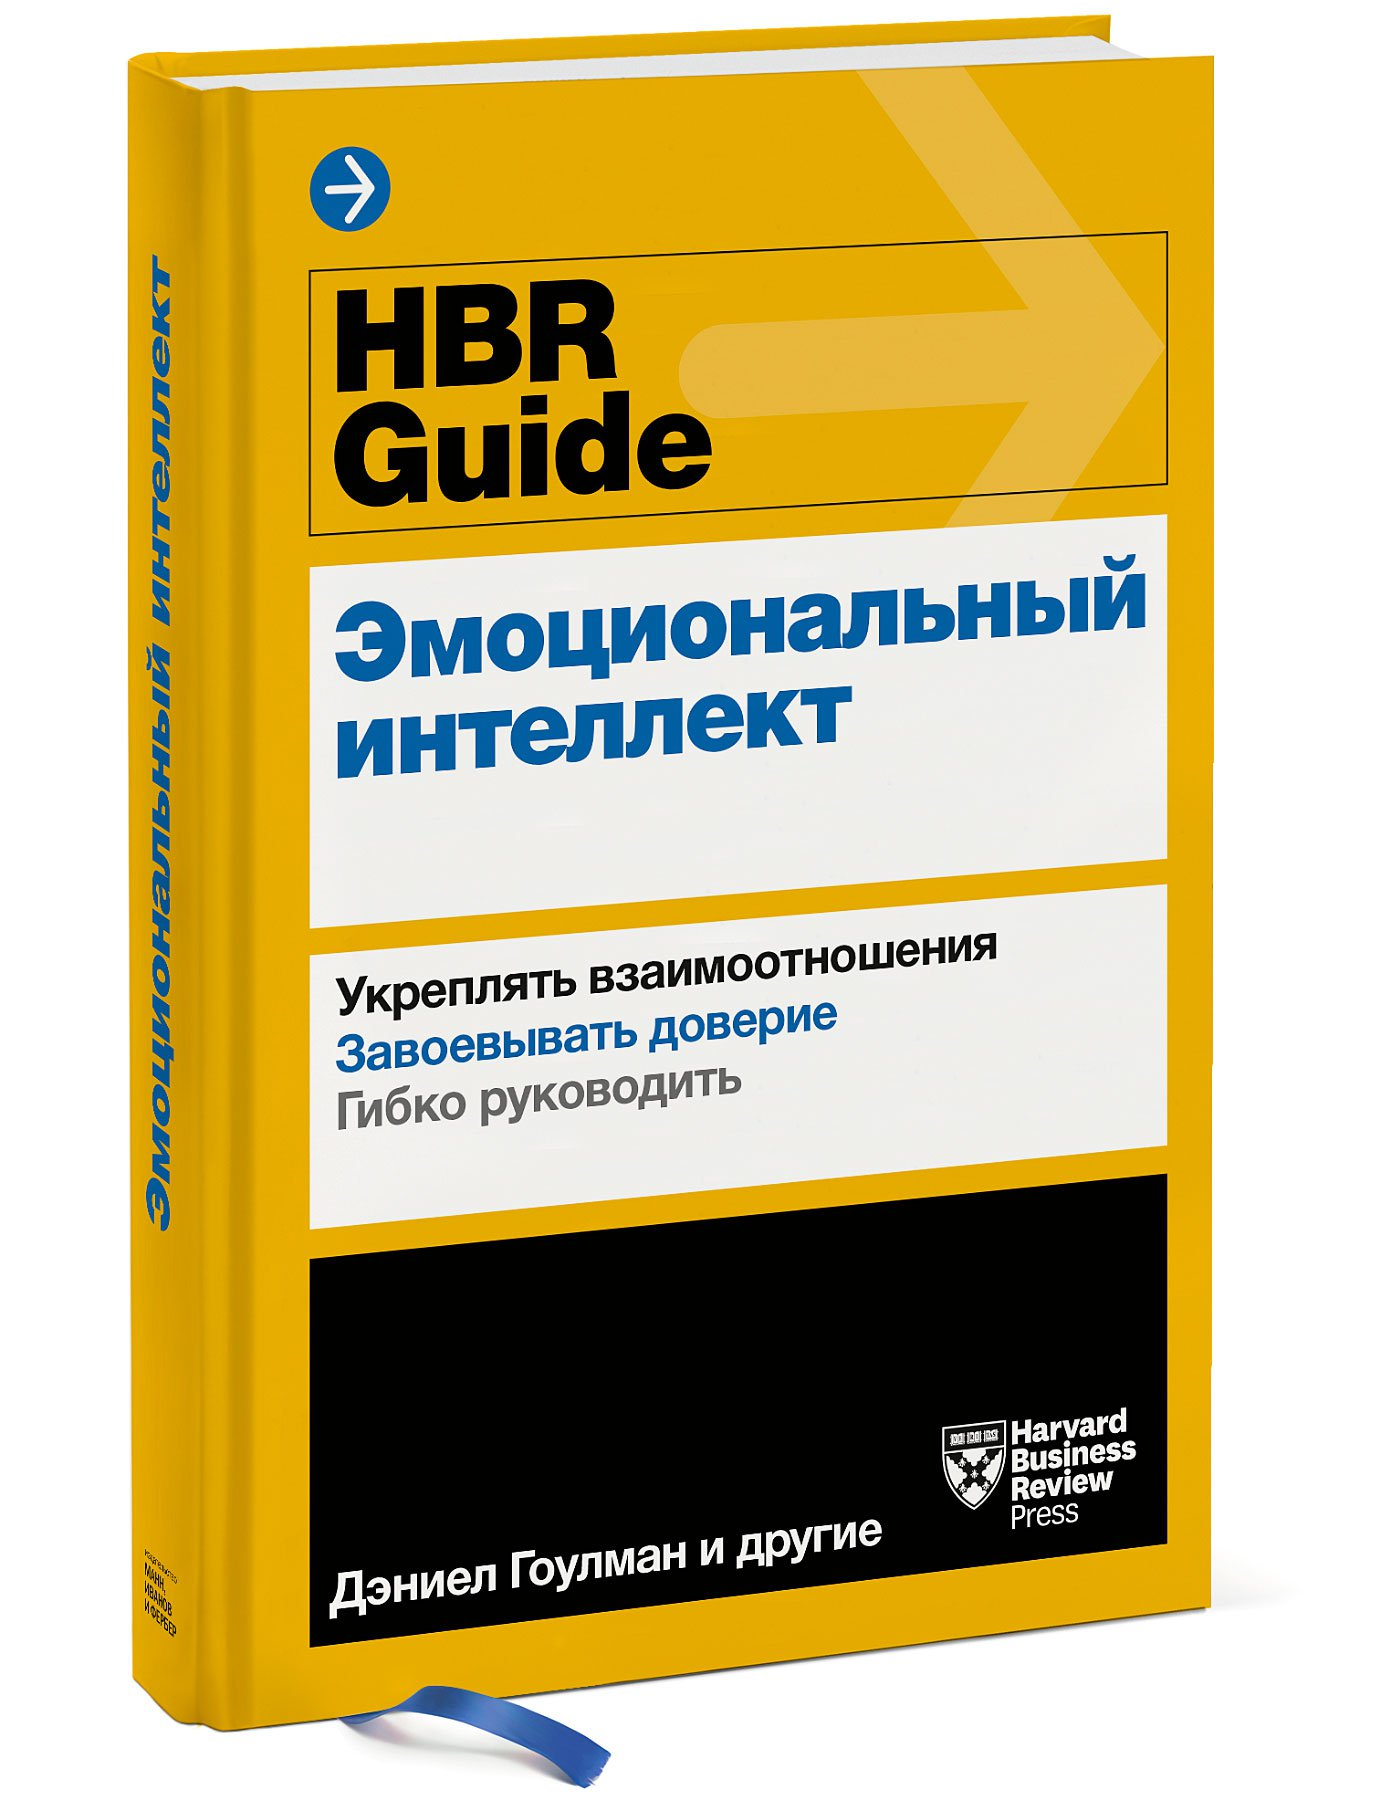 Harvard Business Review HBR Guide. Эмоциональный интеллект harvard business review hbr инновационный менеджмент